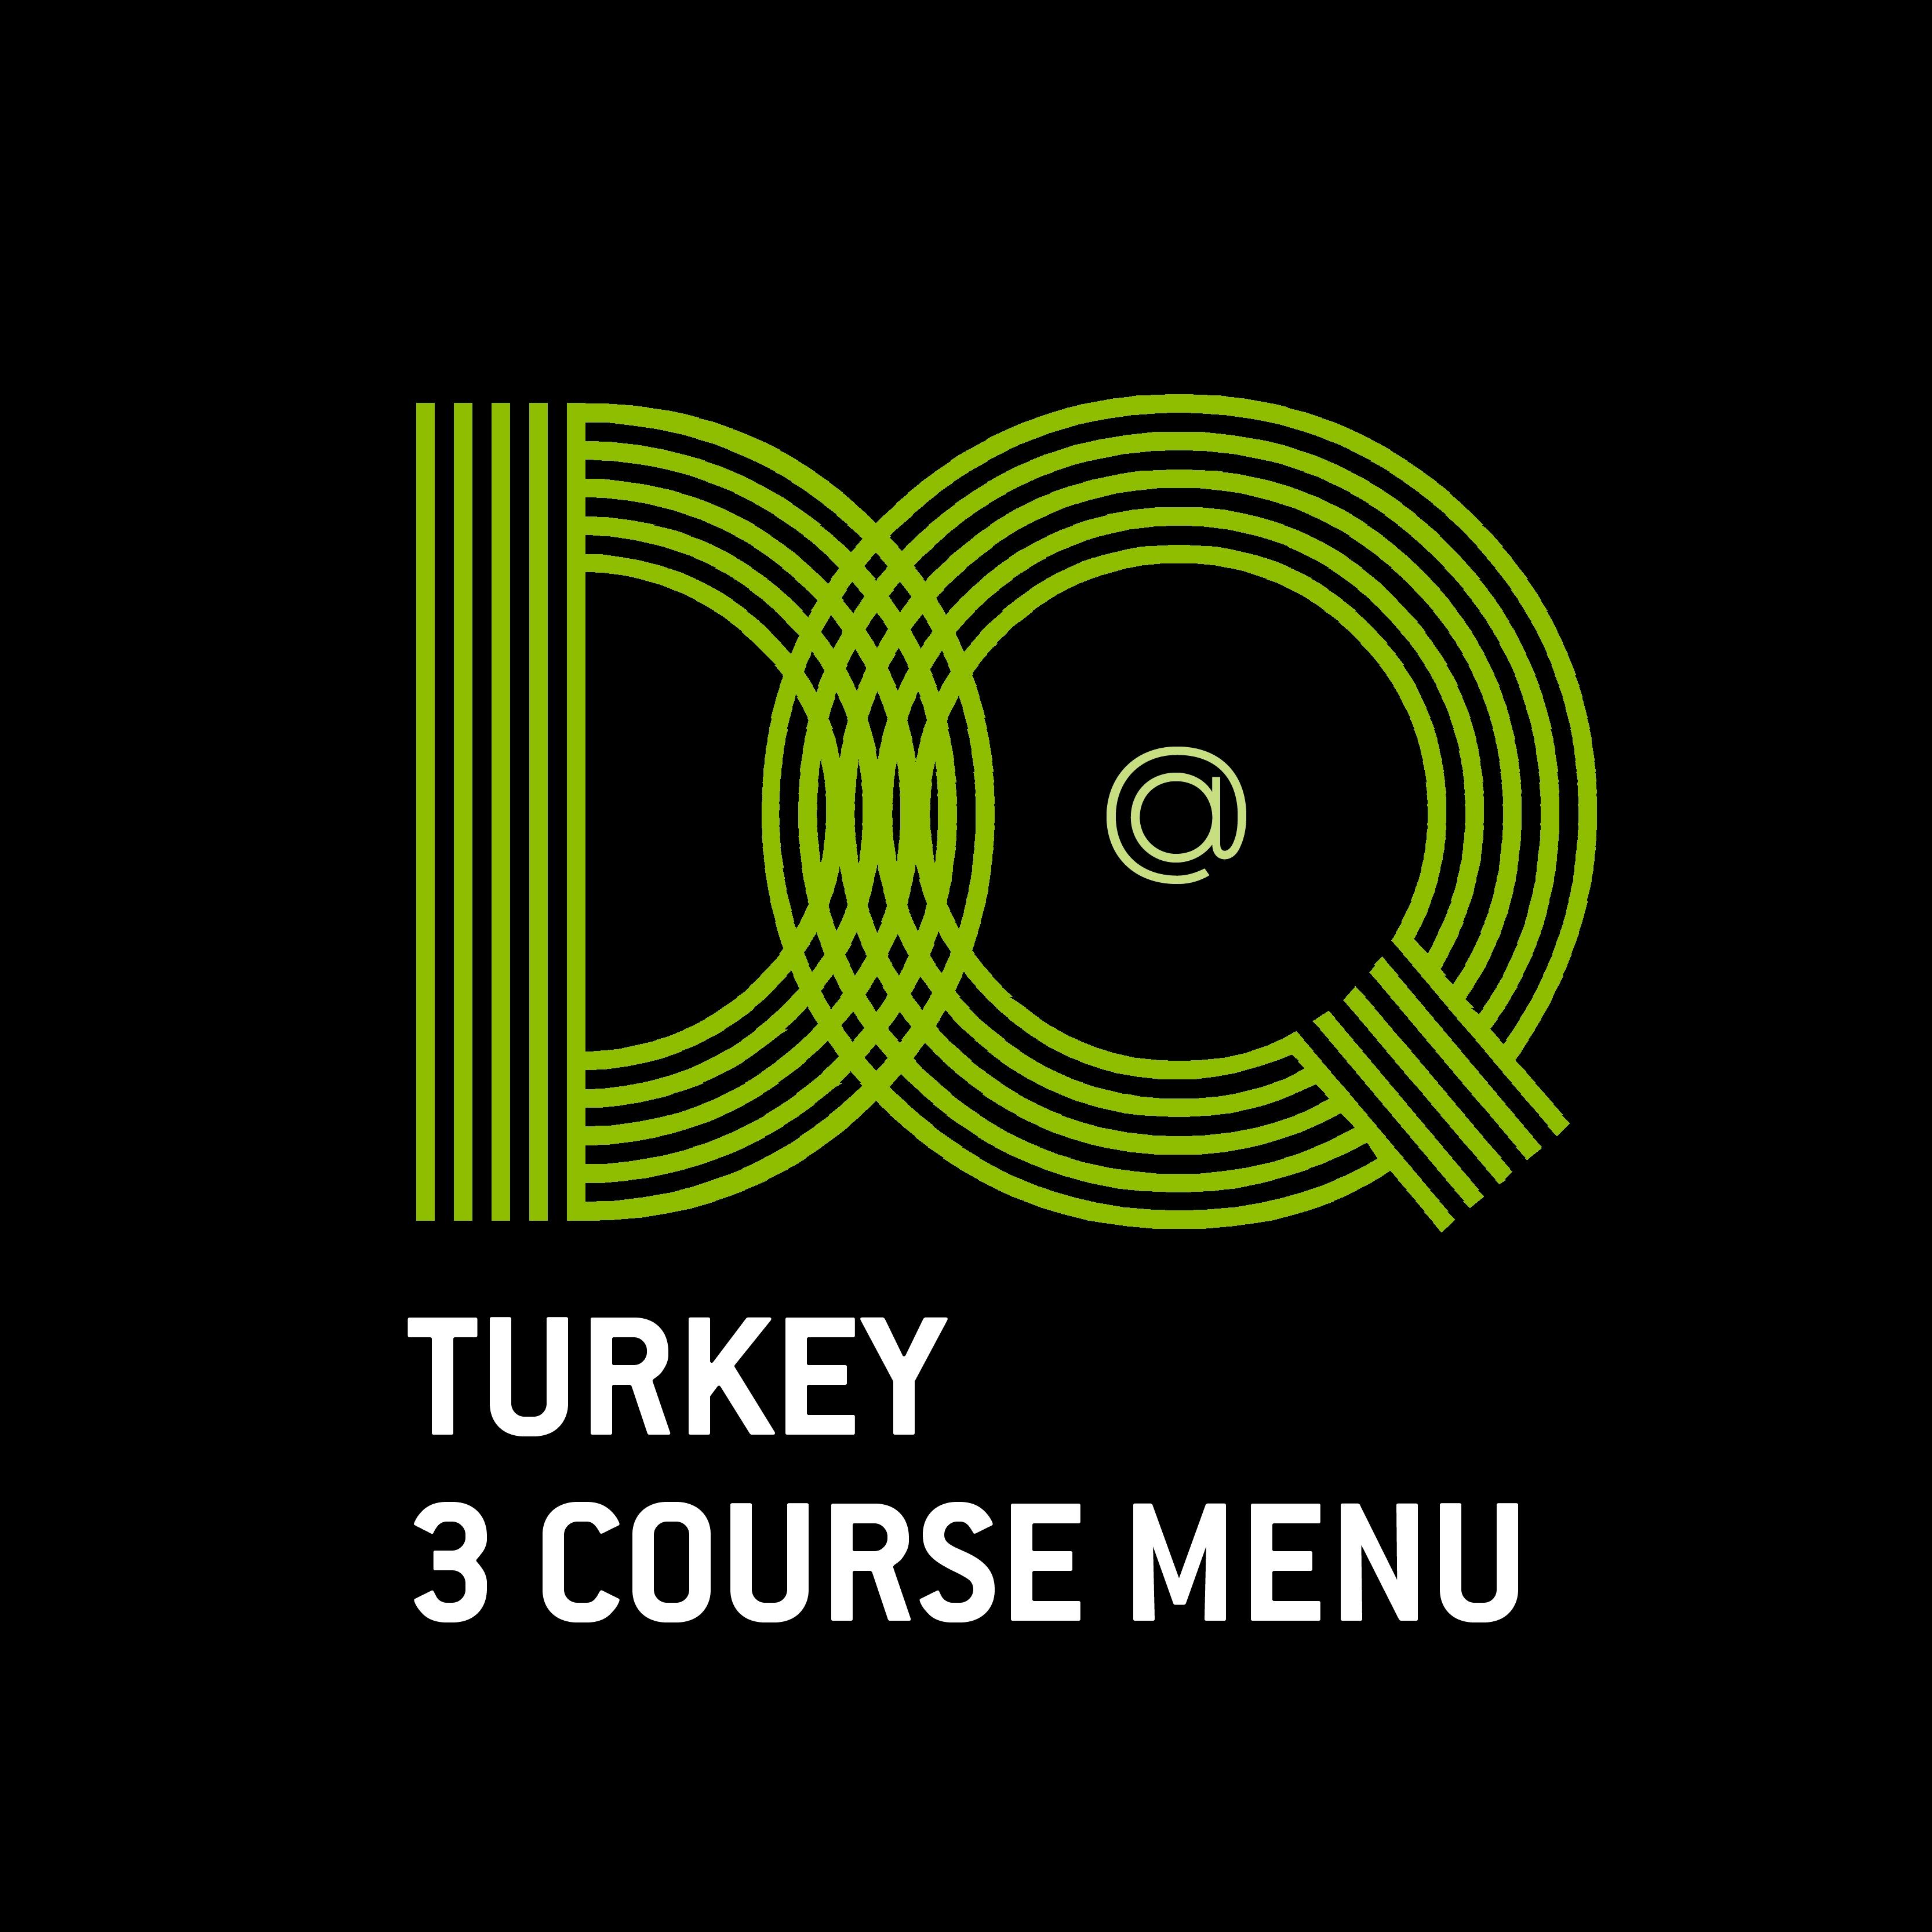 21. DQ - TURKEY 3 COURSE MENU